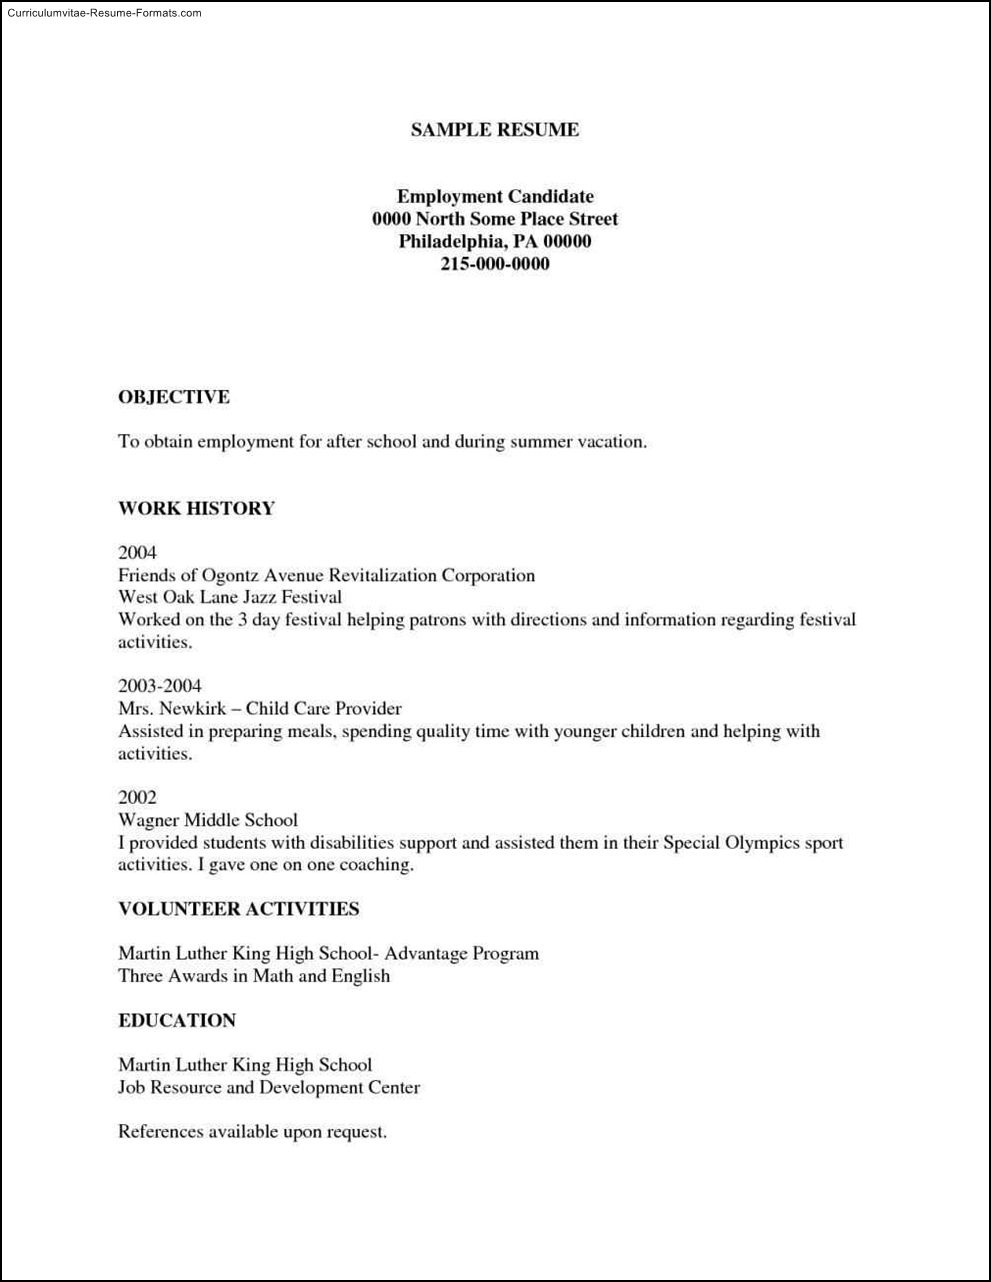 Free Printable Resumes Templates Free Samples Examples Format Resume - Free Online Resume Templates Printable